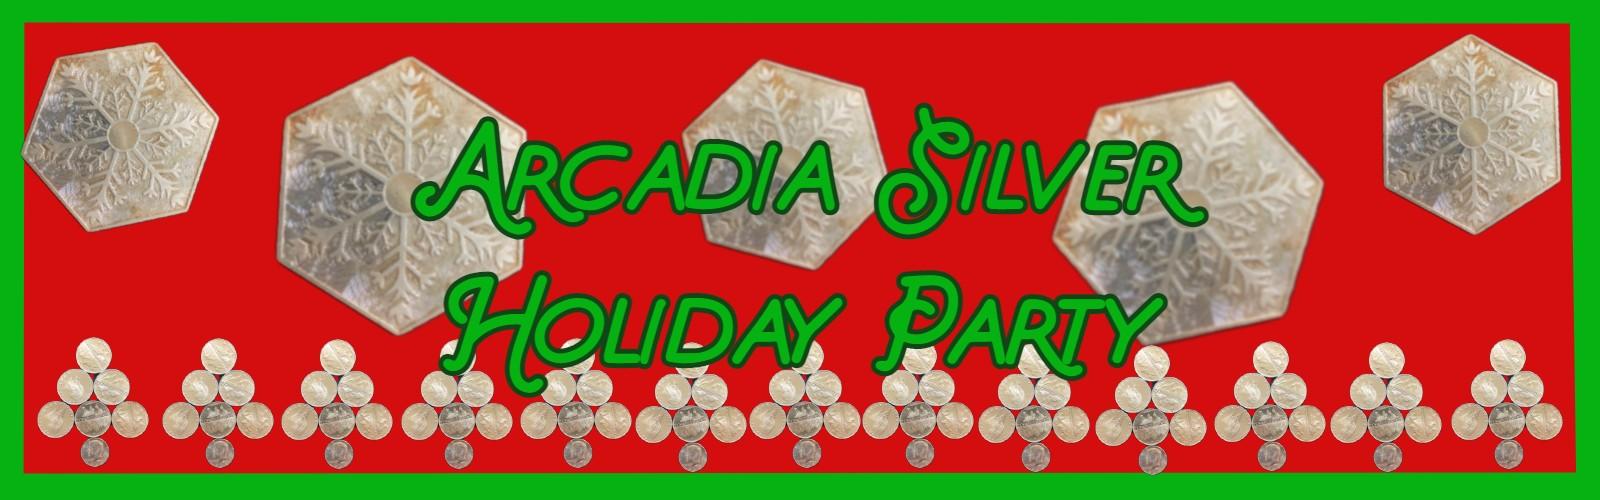 Arcadia Holiday Silver Party